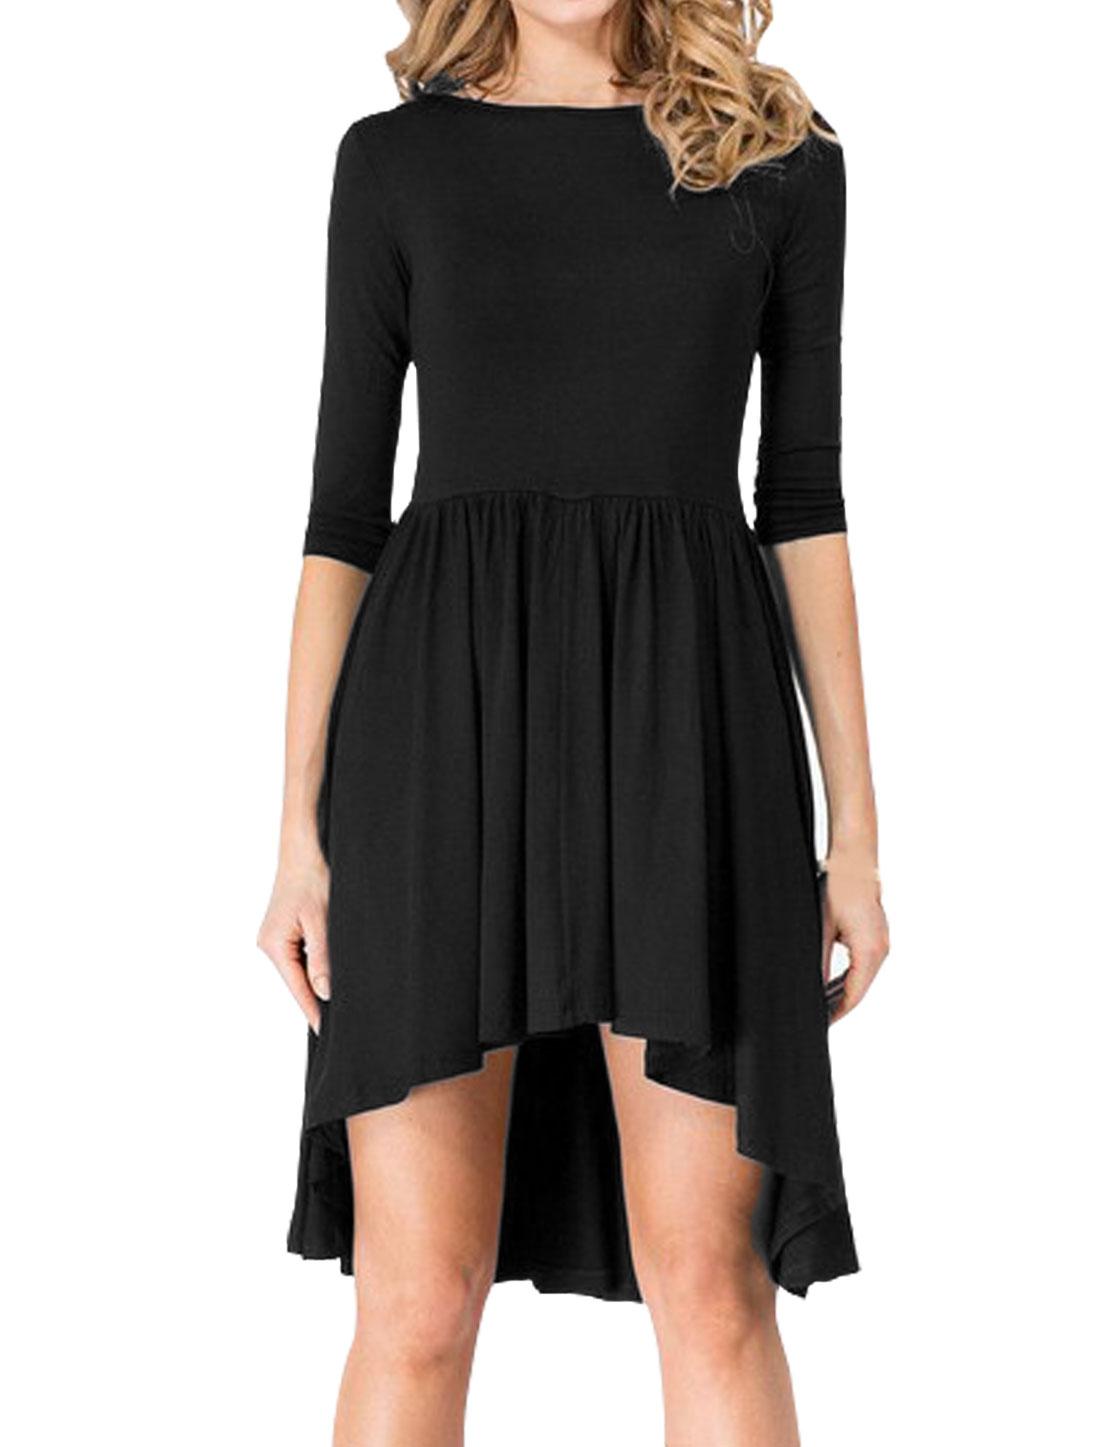 Women 3/4 Sleeves Pleated Asymmetric Hem Tunic Top Black M